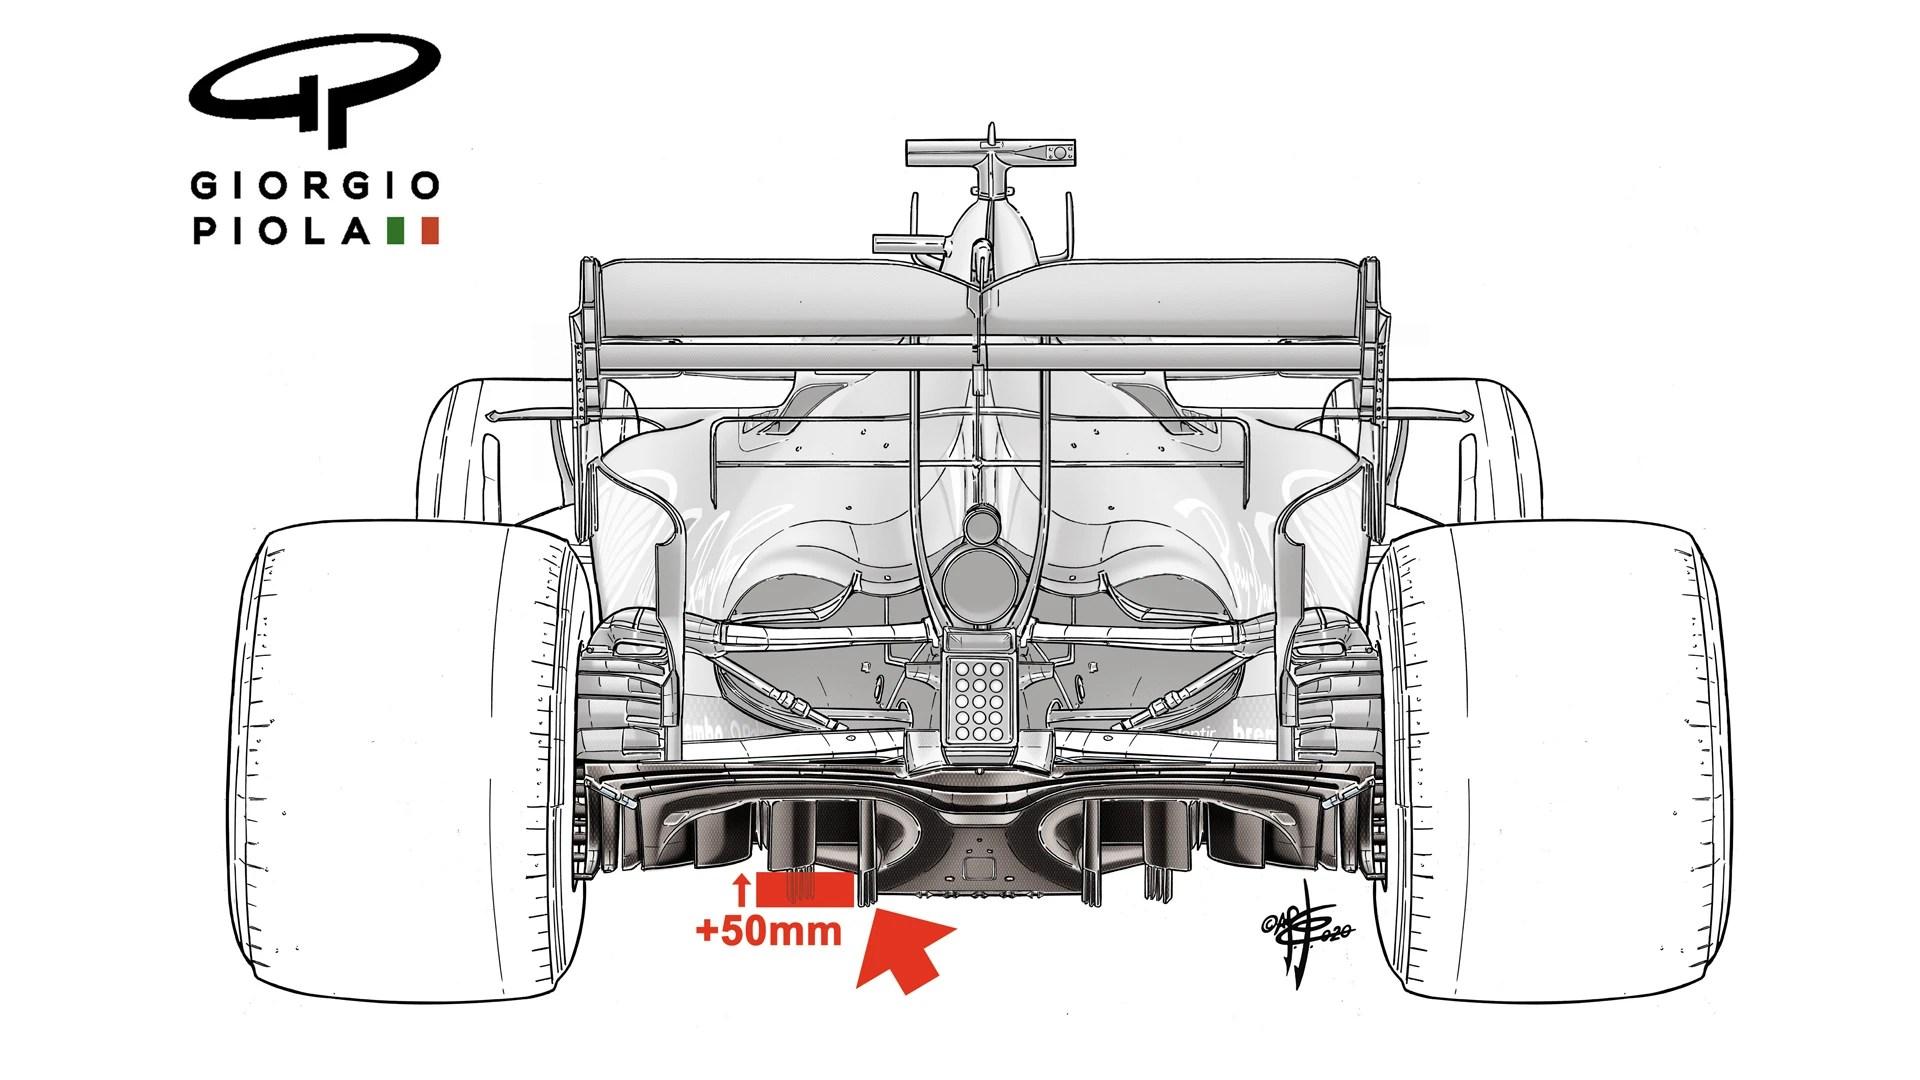 Aston Martin Redbull Racing F1 Team